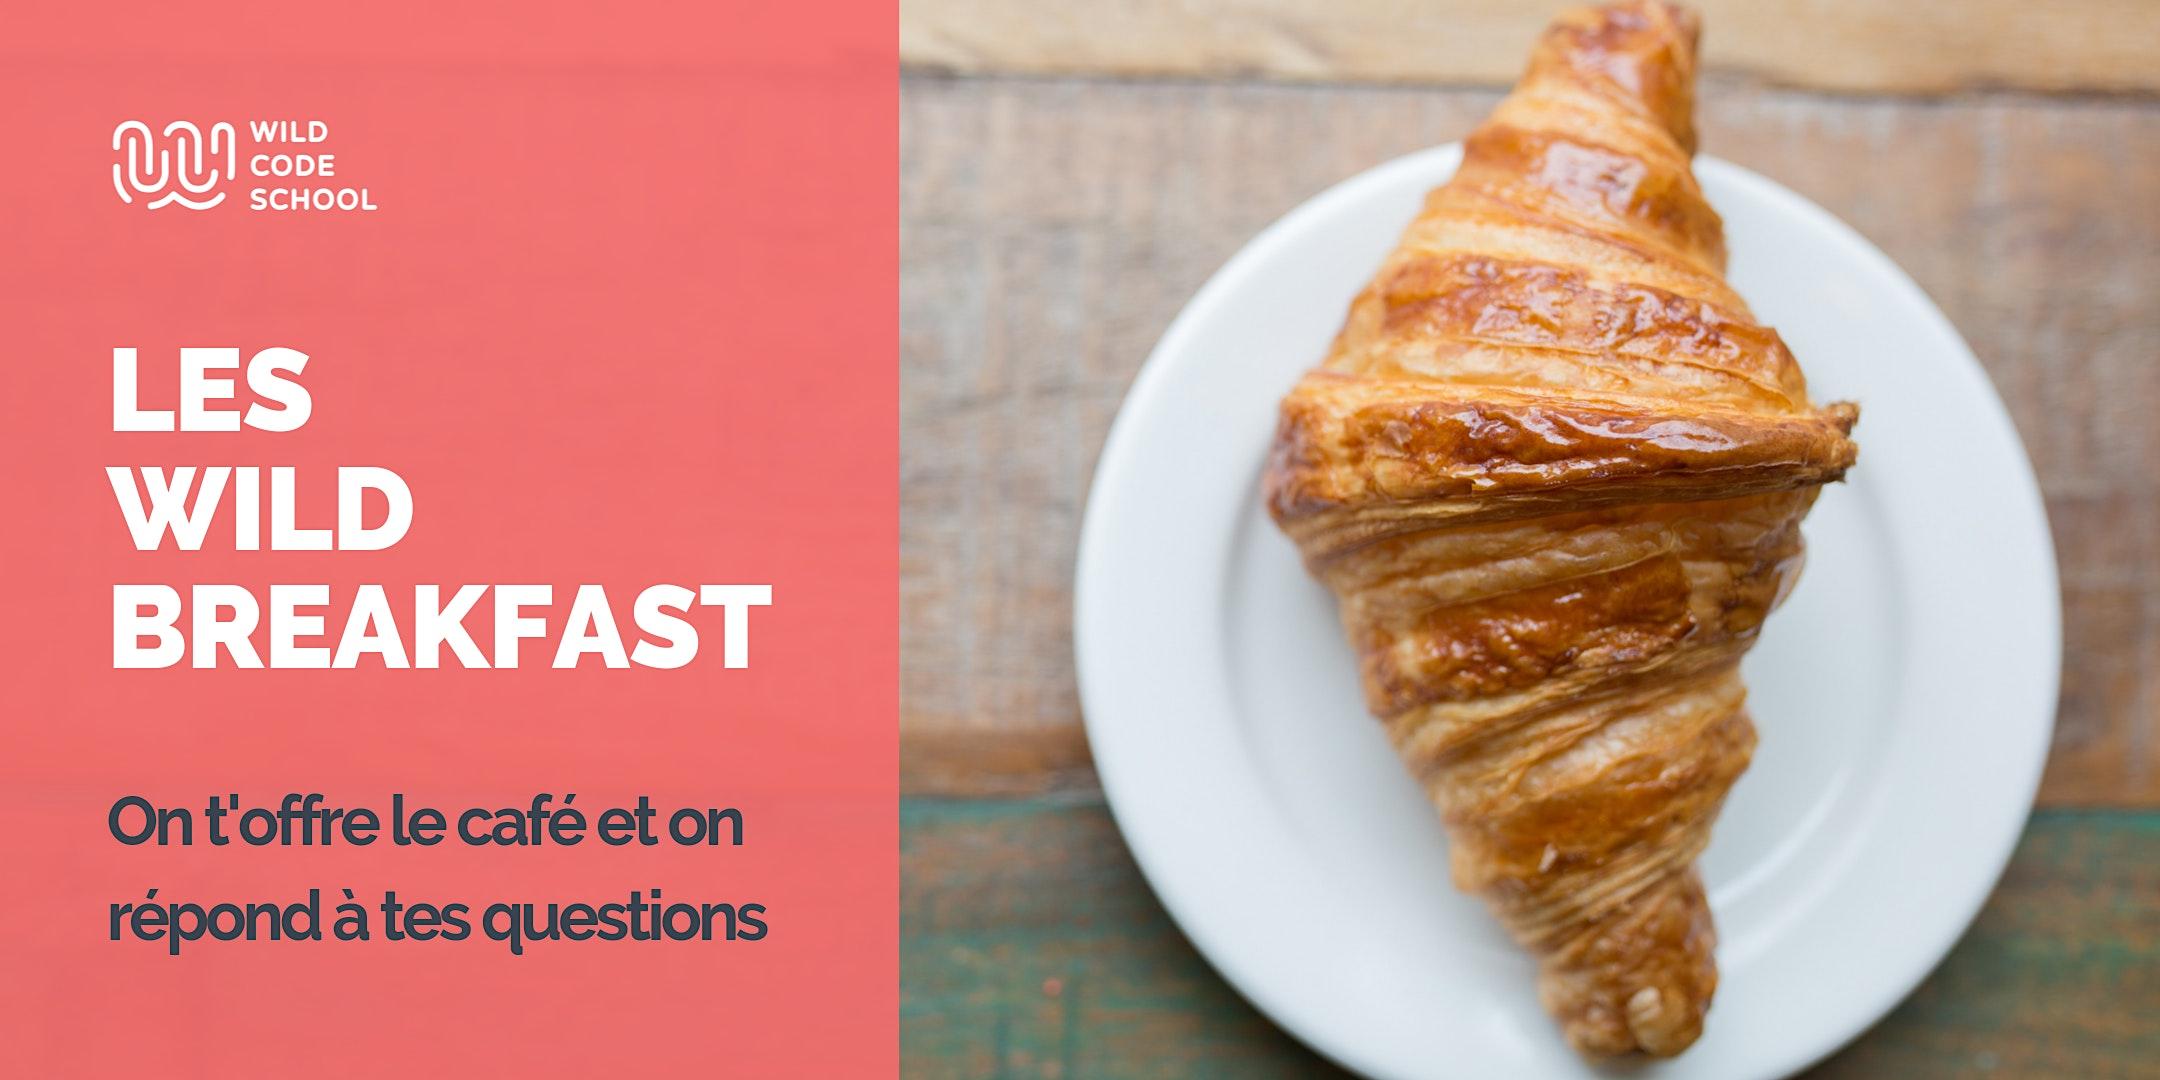 Wild Breakfast - Présentation Ecole & Formations - Wild Code School Paris